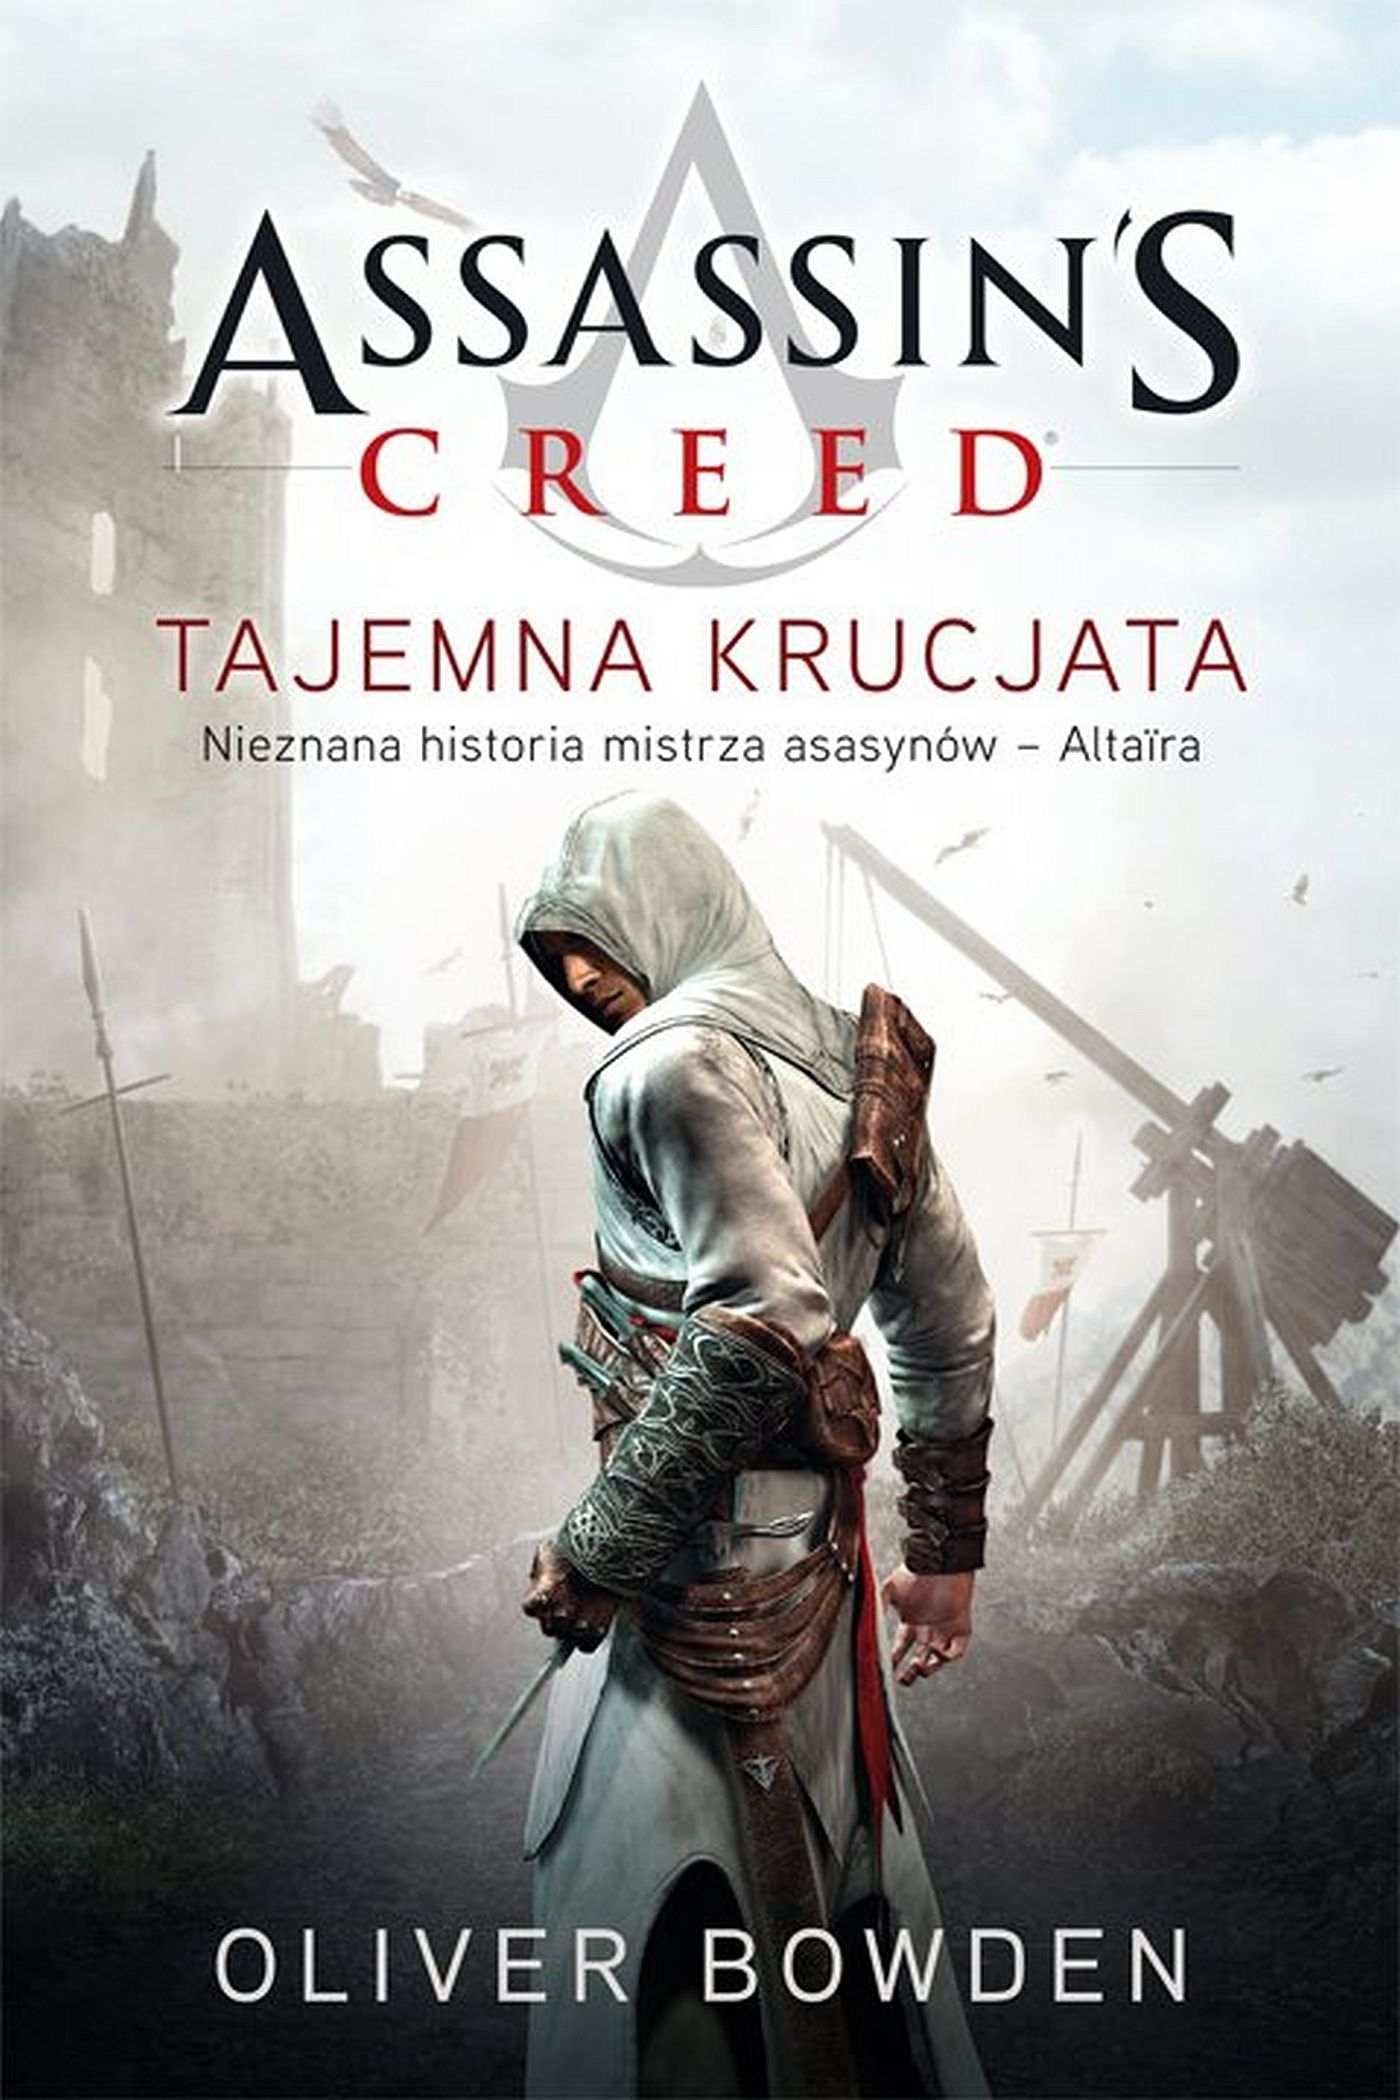 Assassin's Creed: Tajemna krucjata - Ebook (Książka EPUB) do pobrania w formacie EPUB